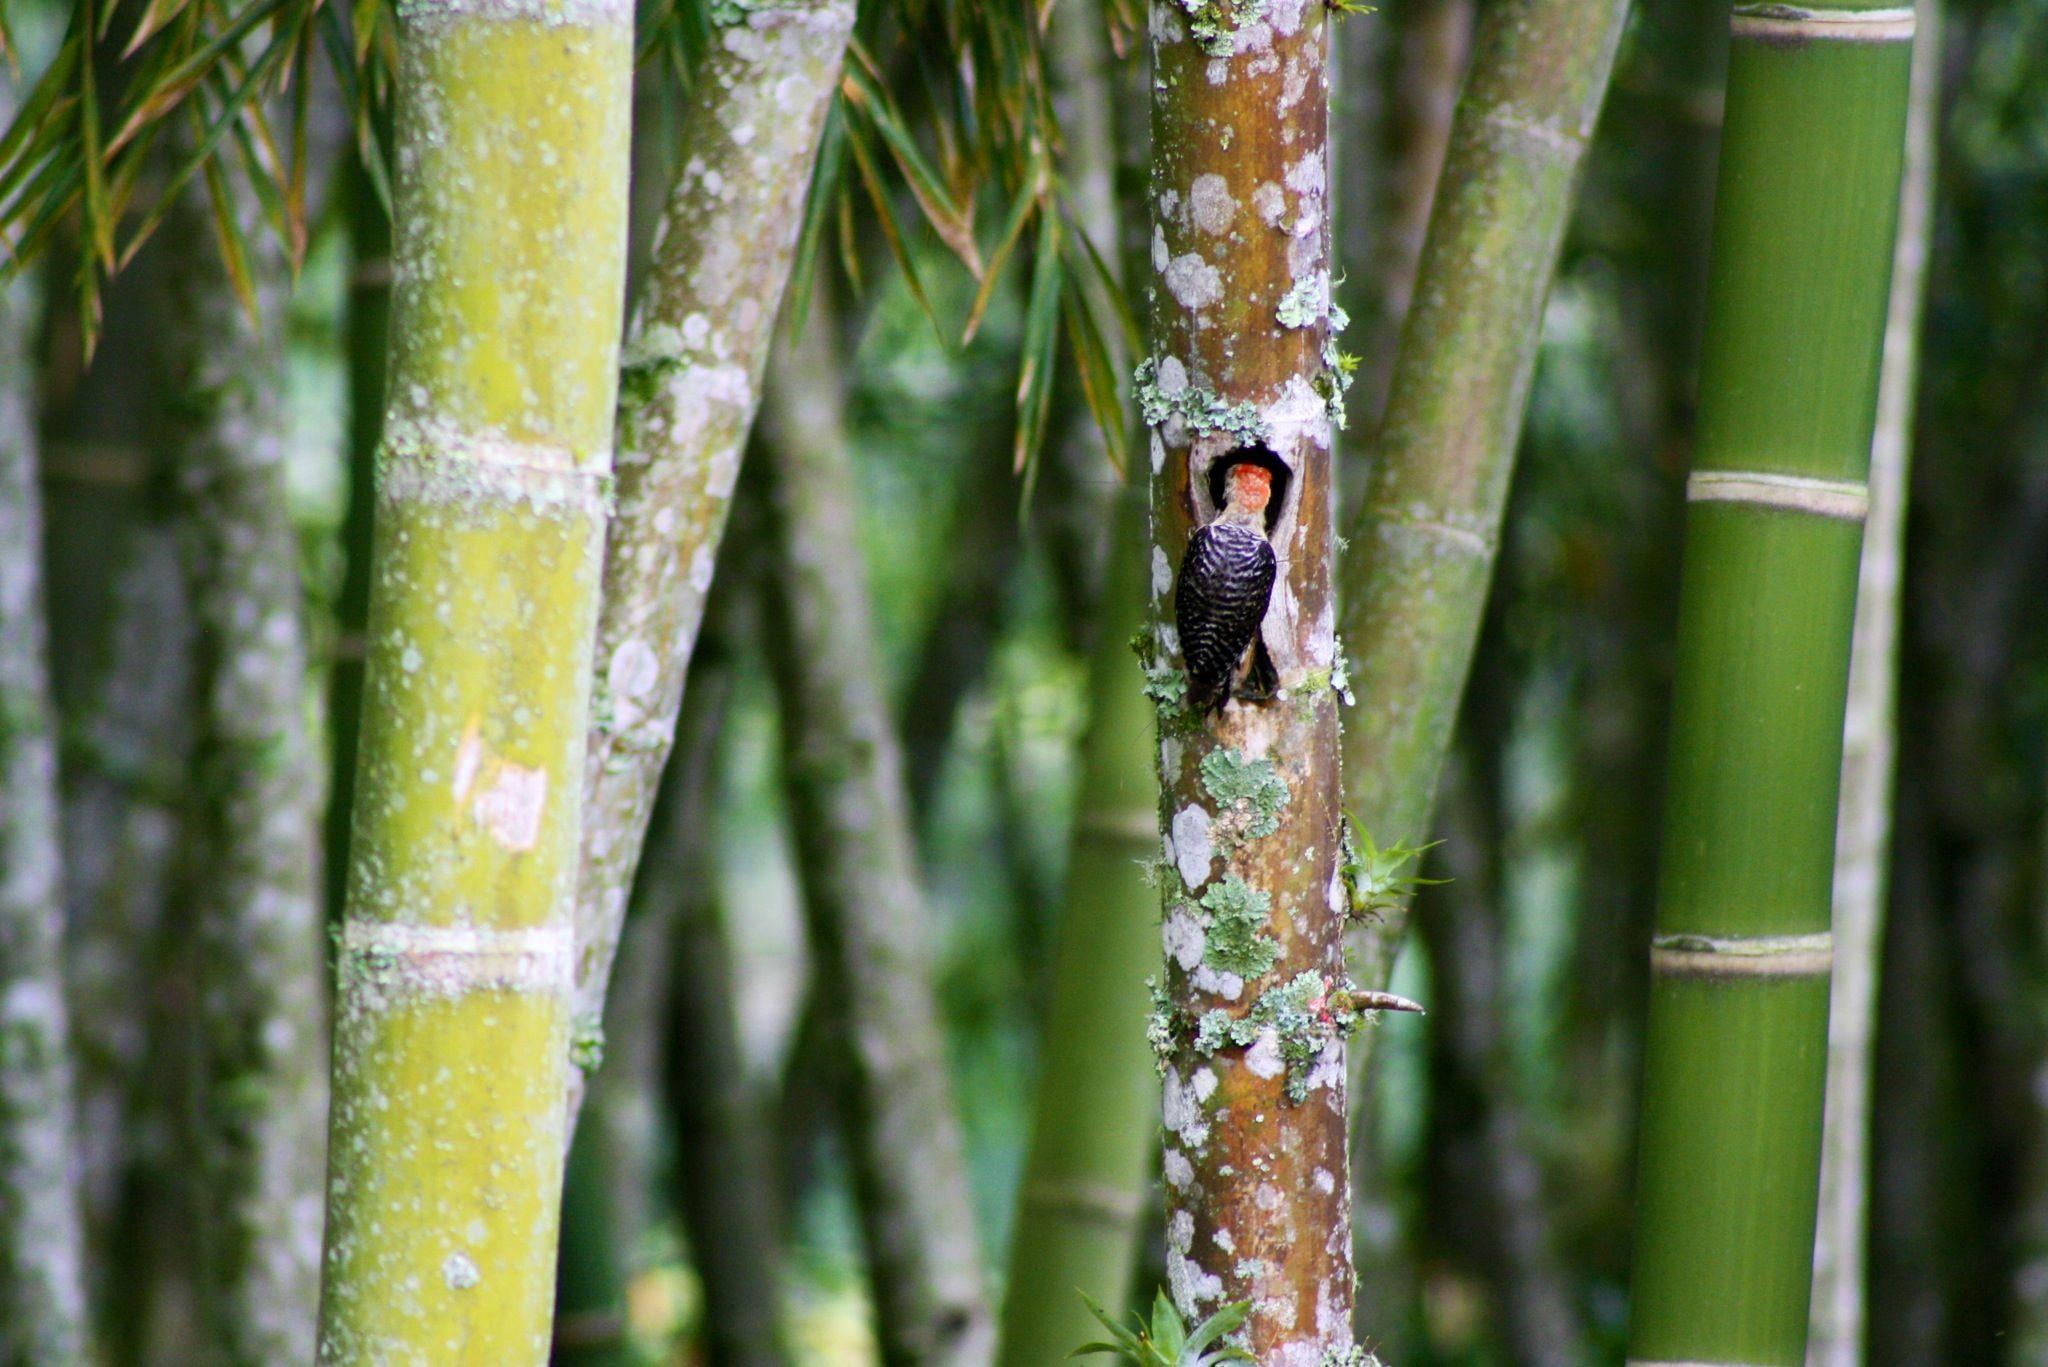 Woodpecker in bamboo